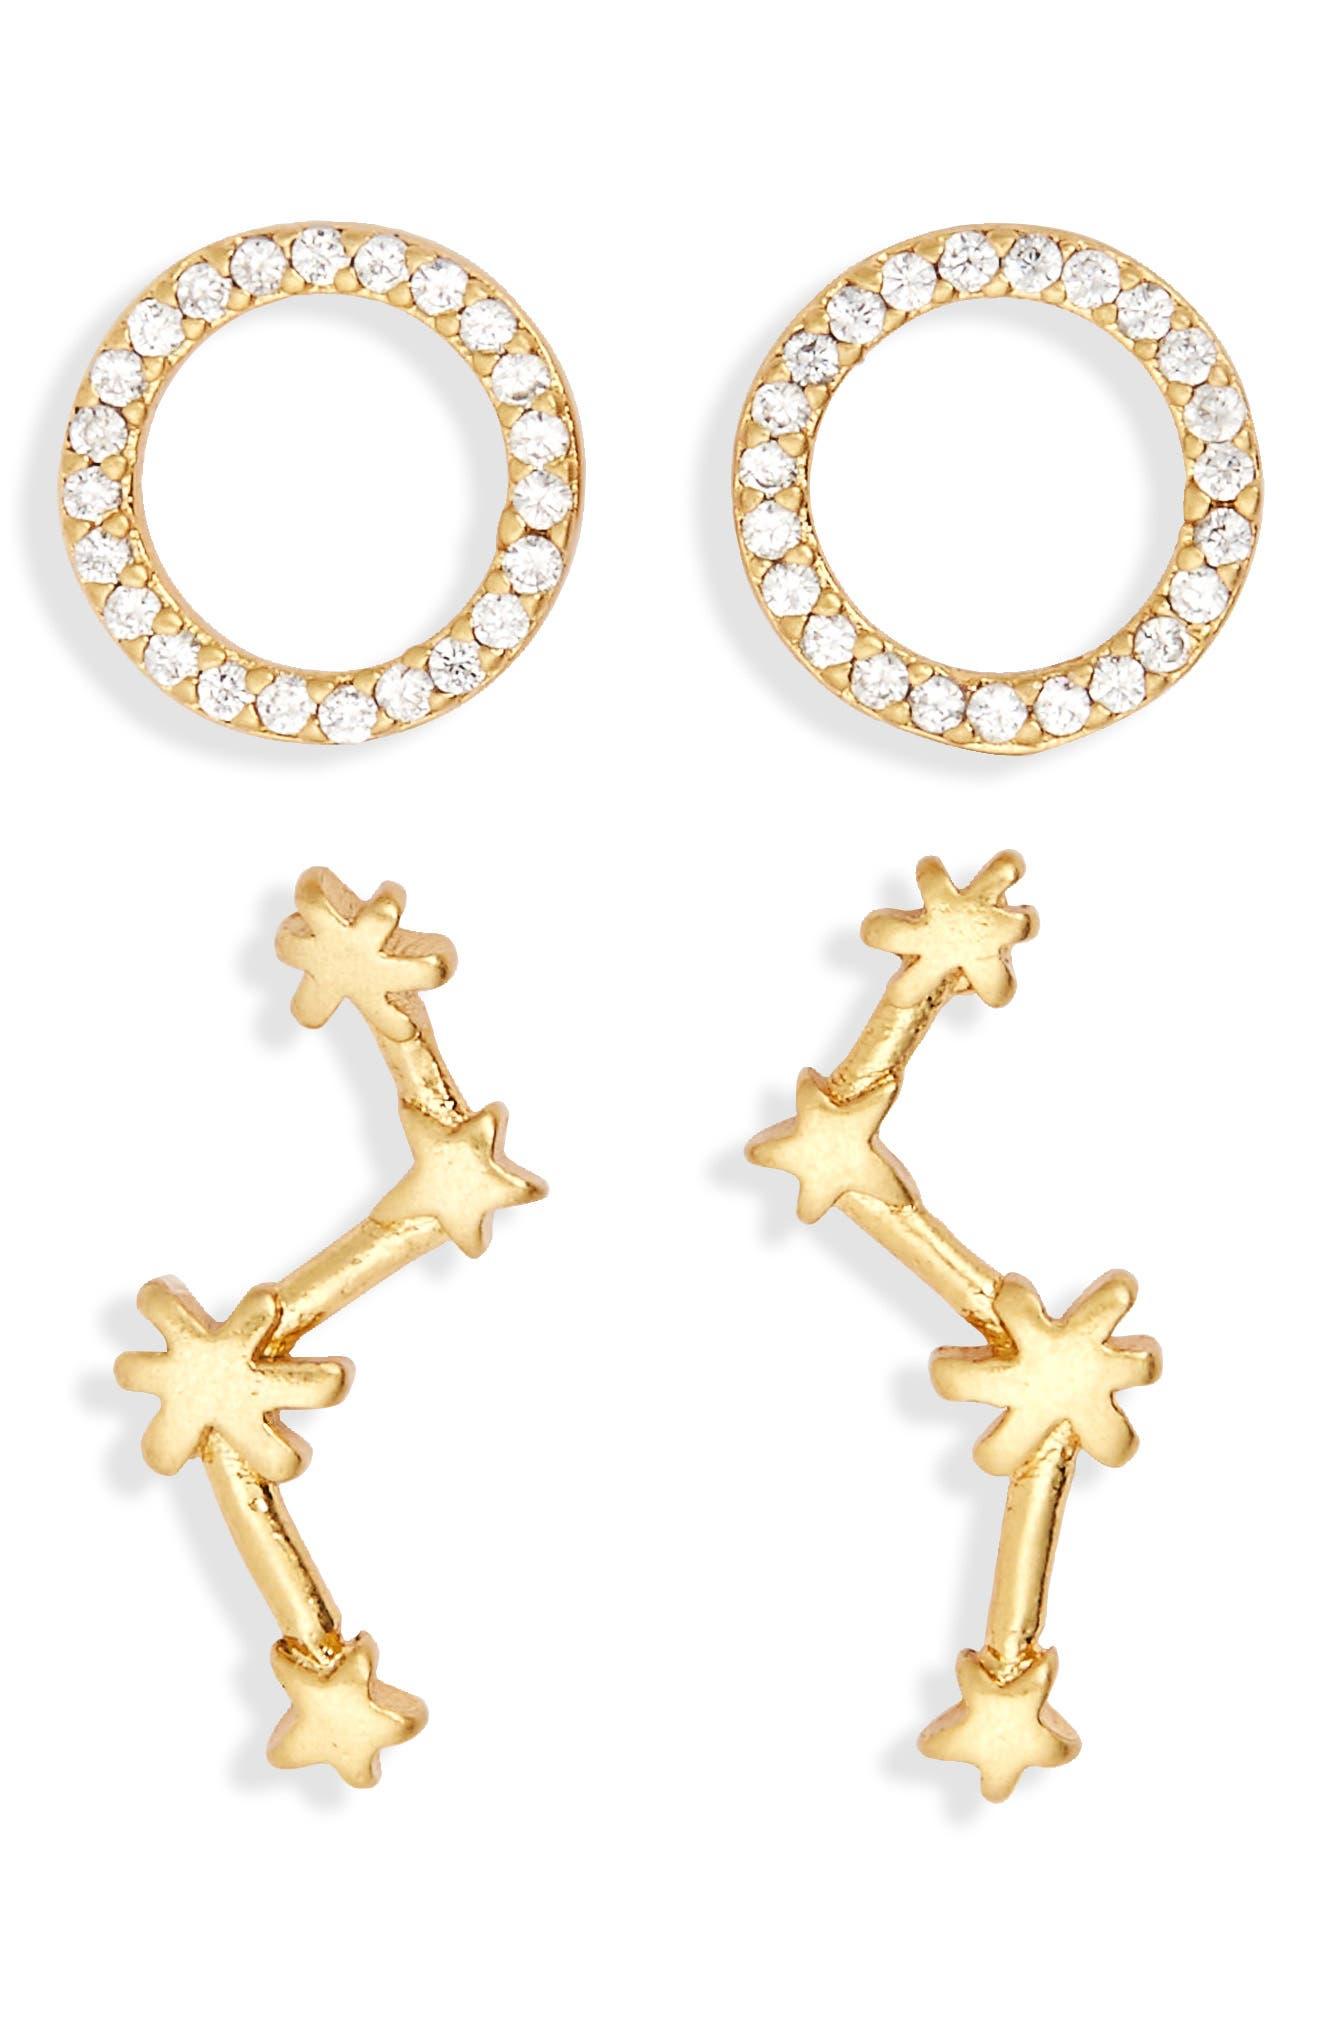 Set of 2 Mismatched Stud Earrings,                             Main thumbnail 1, color,                             Vintage Gold